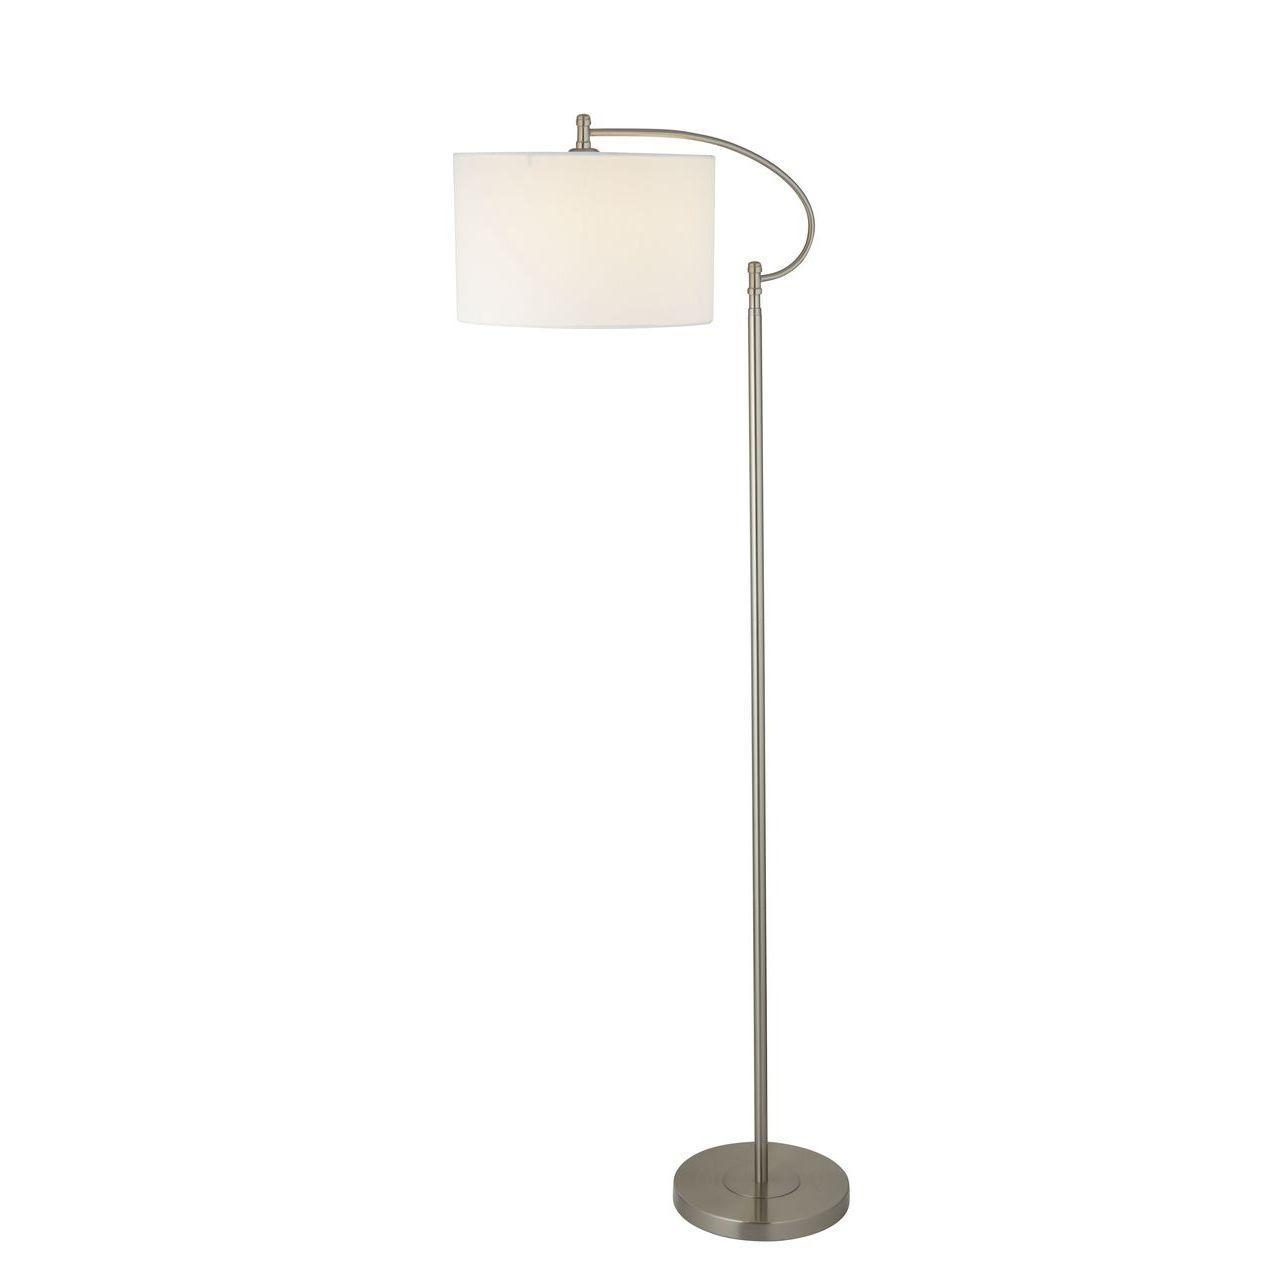 Торшер Arte Lamp Adige A2999PN-1SS arte lamp торшер arte lamp california a2872pn 1ss